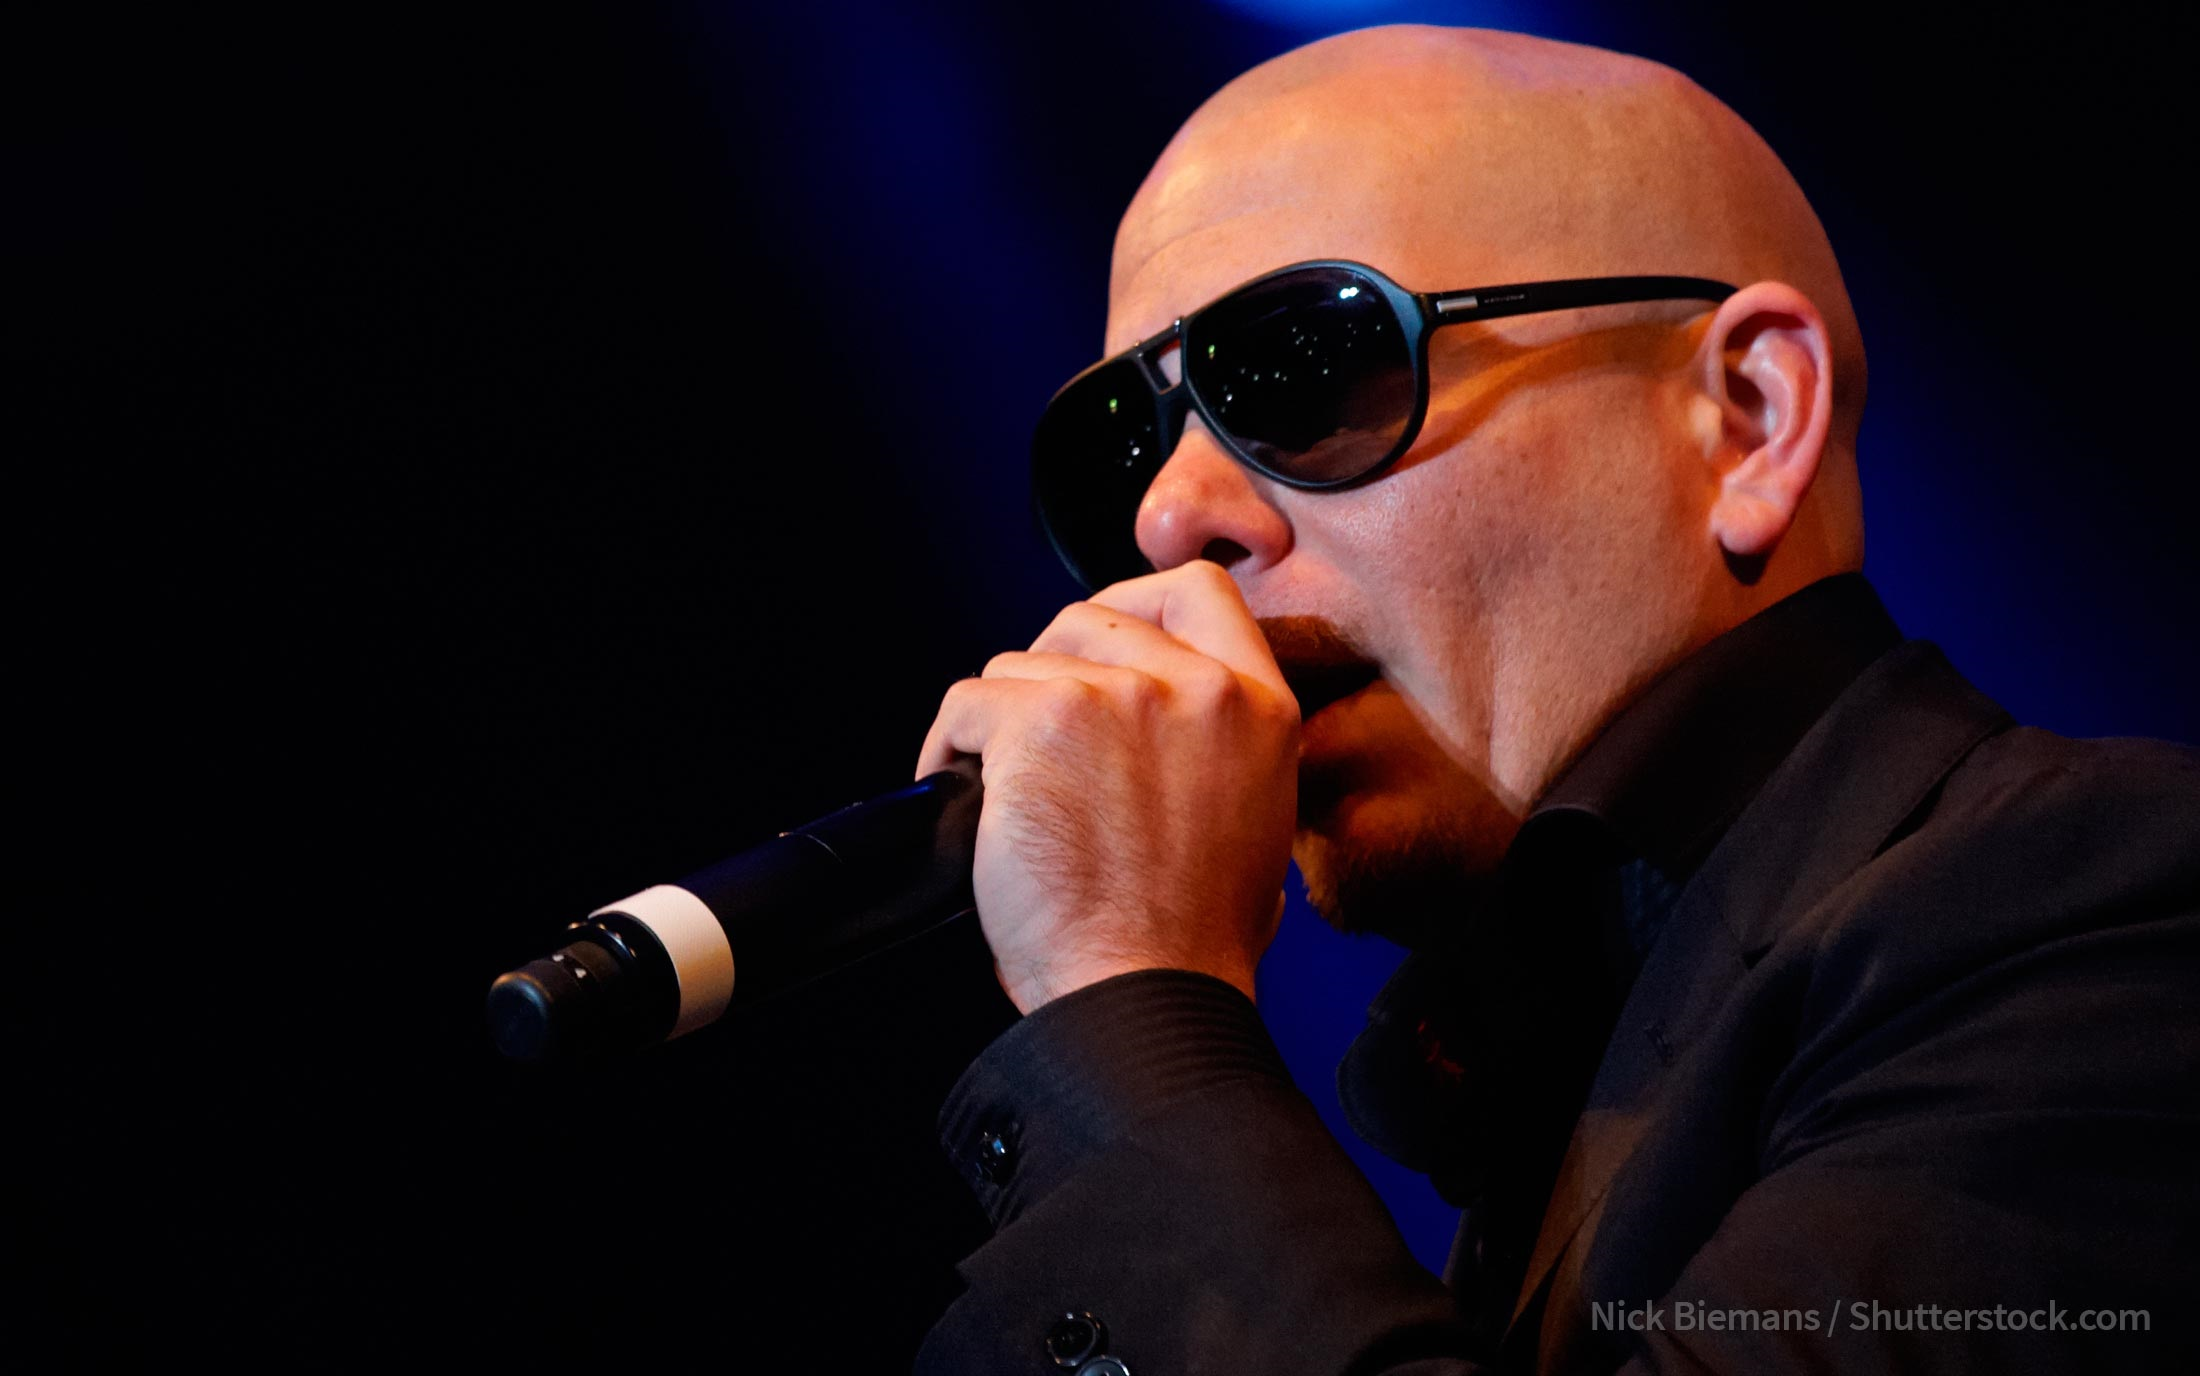 Rapper Pitbull's Net Worth Reaches $65 Million on His 35th